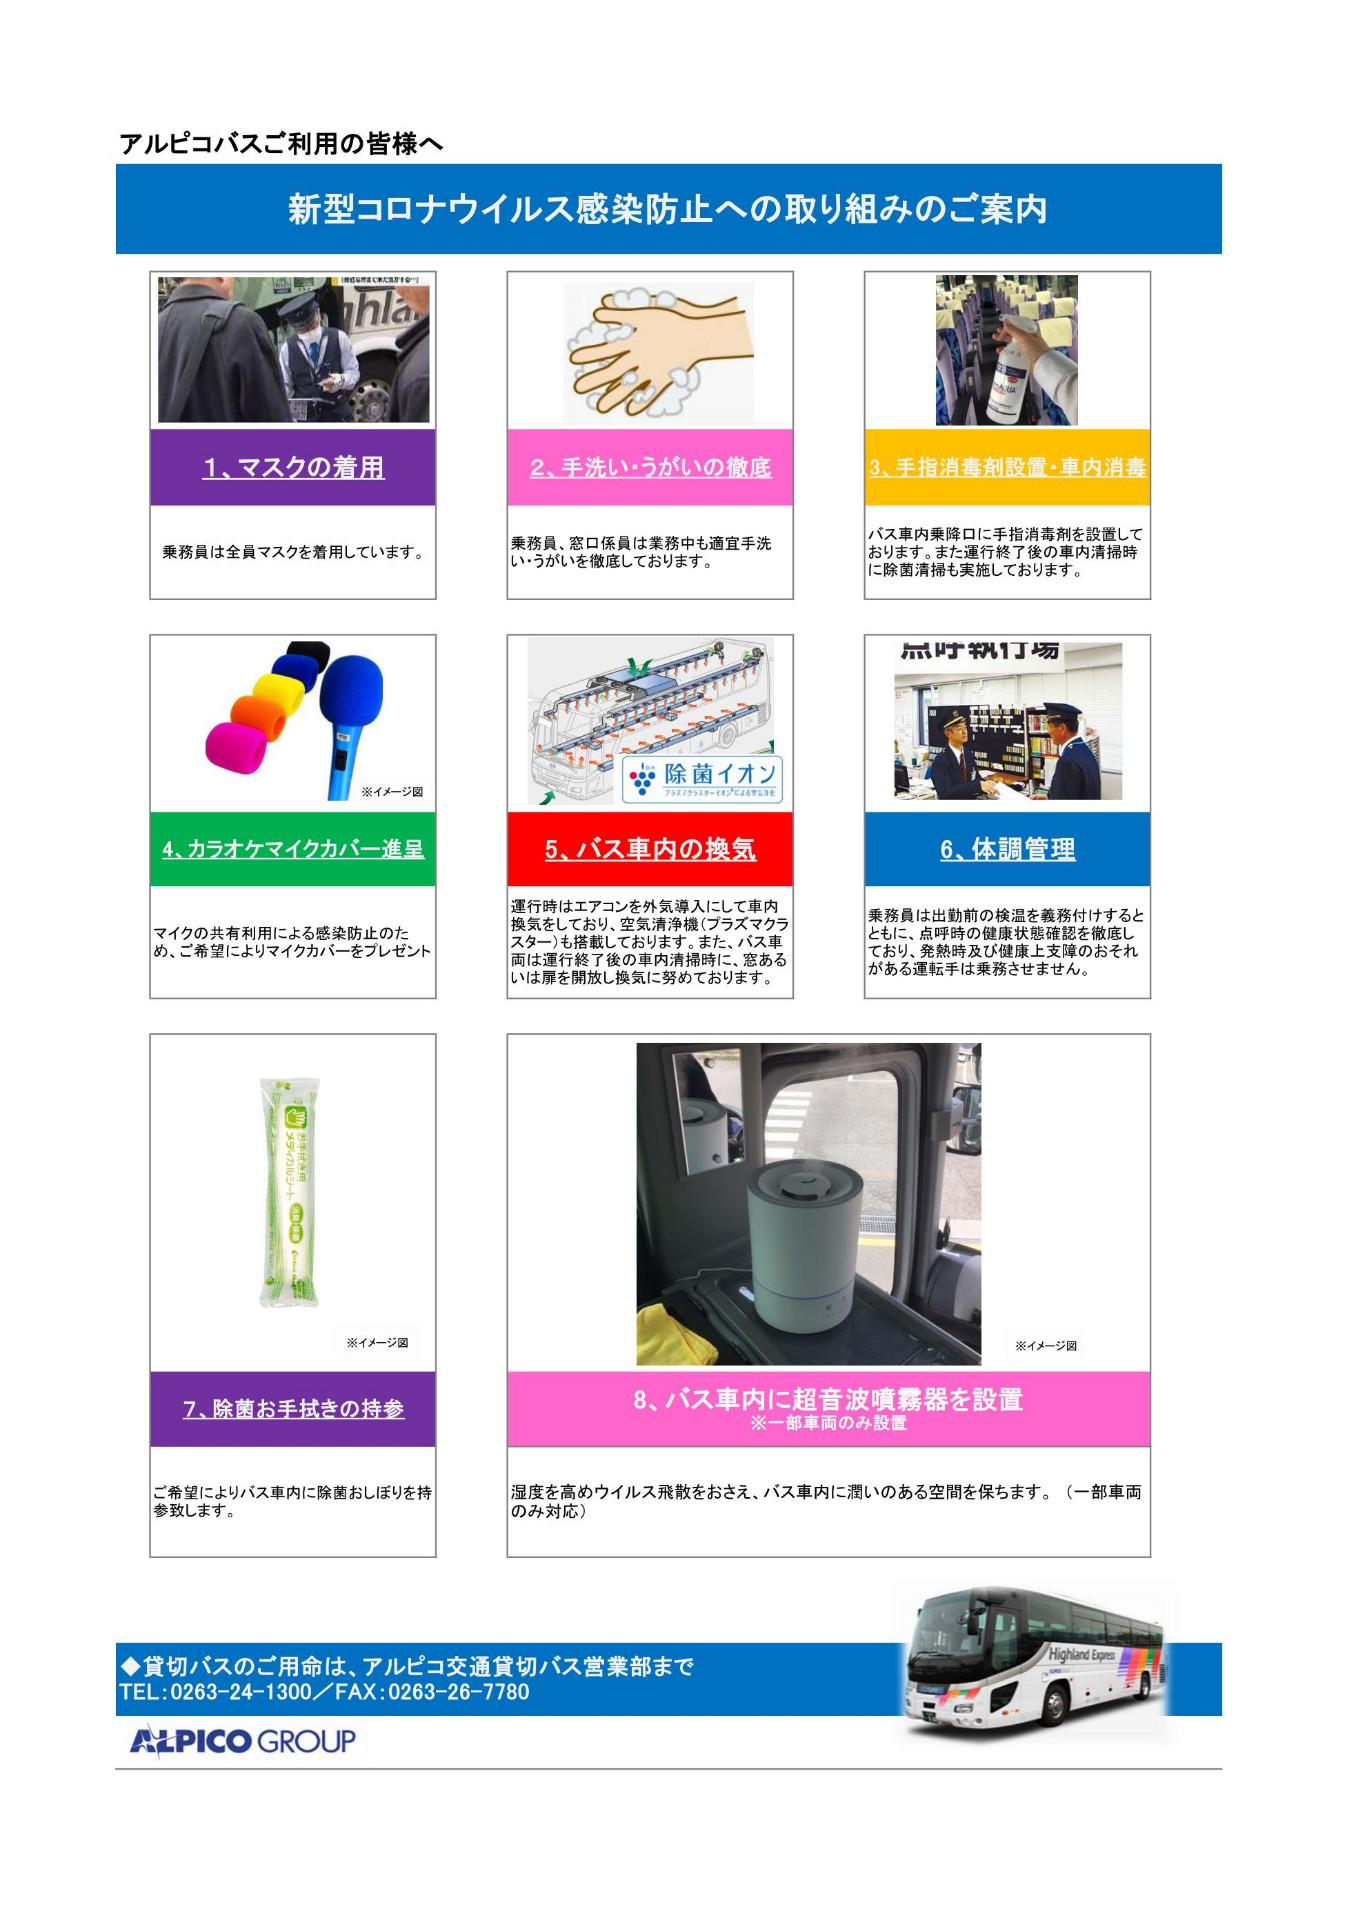 https://www.alpico.co.jp/traffic/datas/images/2020/06/01/3bba33e96c1b414bdc848f45b3a68ebf219362e1.jpg